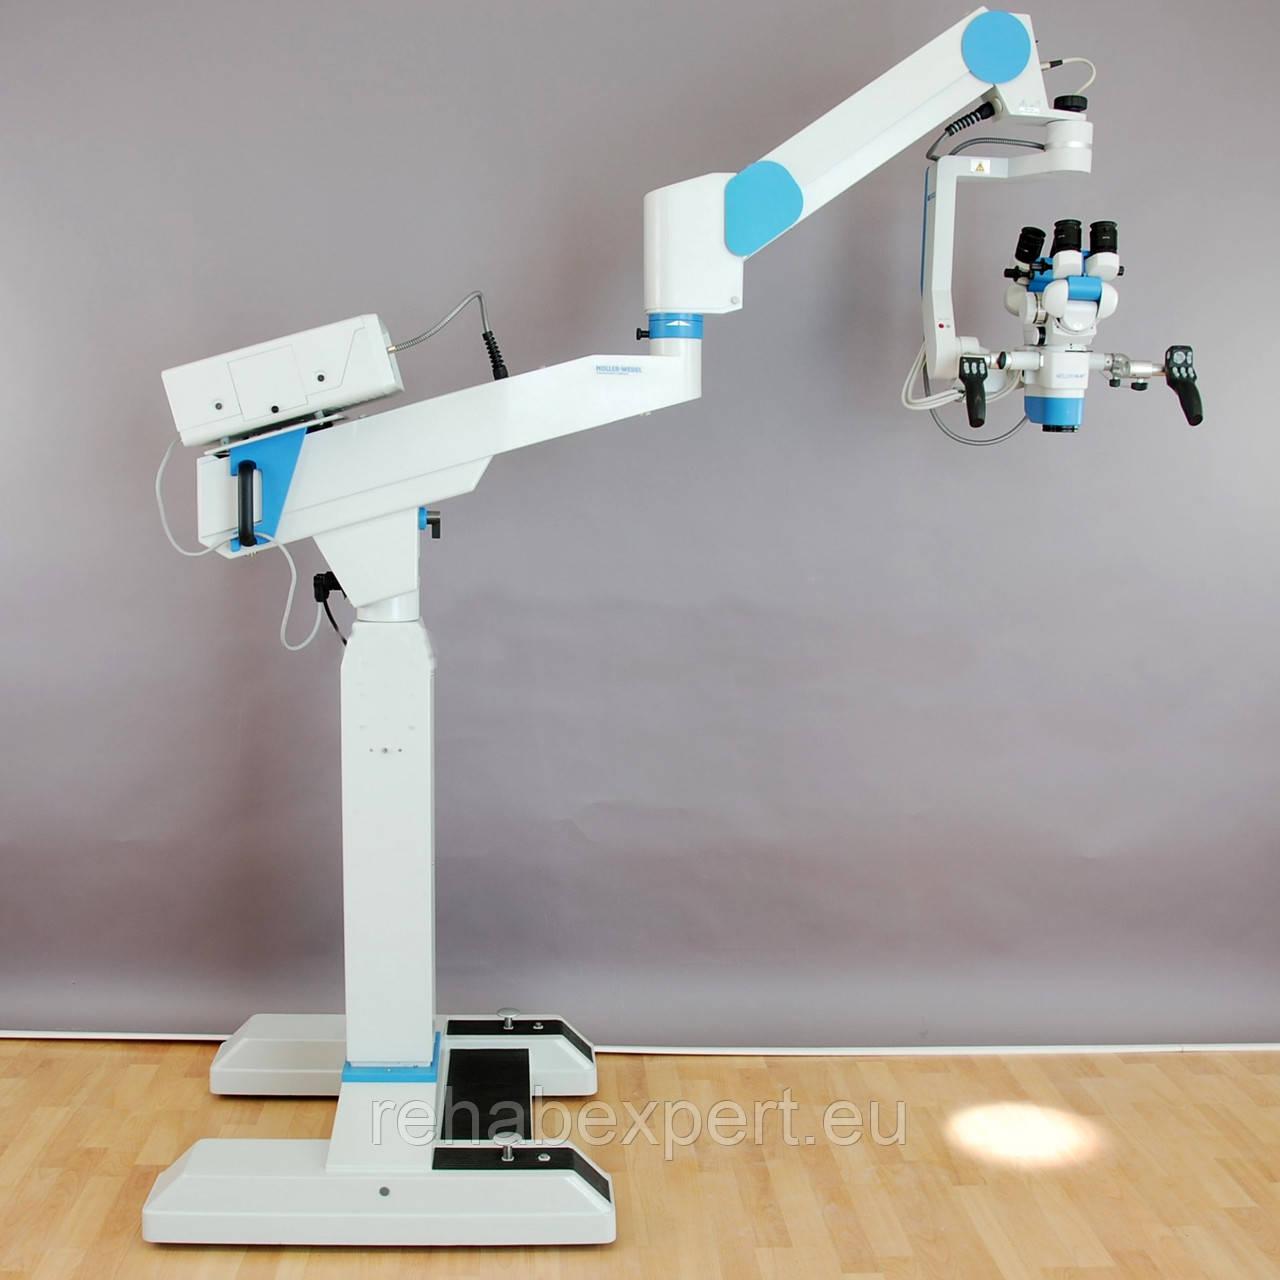 Операционный Микроскоп для нейрохирургии Moller-Wedel Hi-R 1000 Neurosurgery Microscope